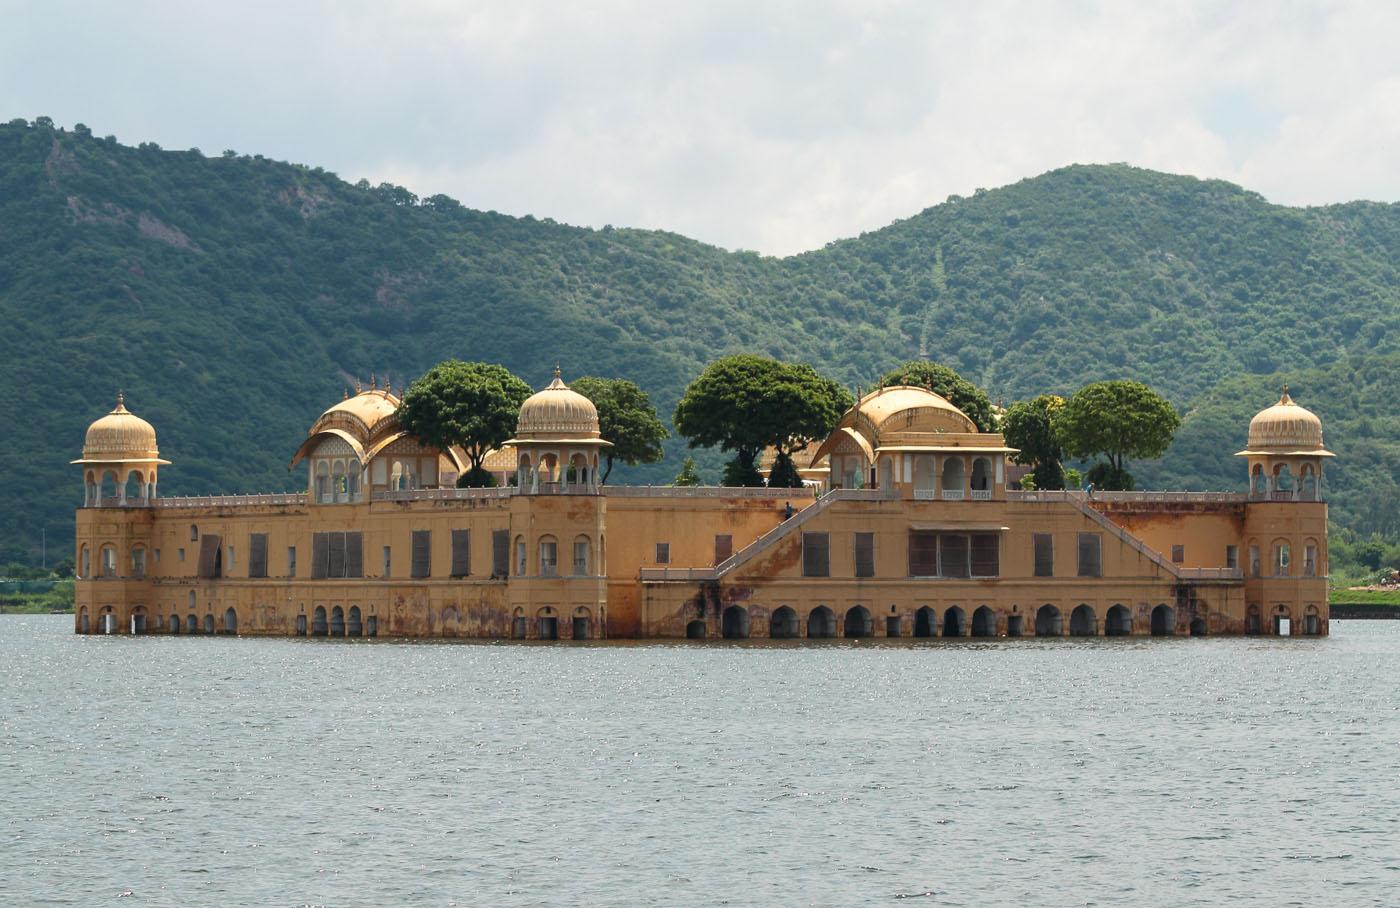 Фотография 21. Плавающий дворец Джал-Махал. Отчеты об экскурсии в Джайпур.